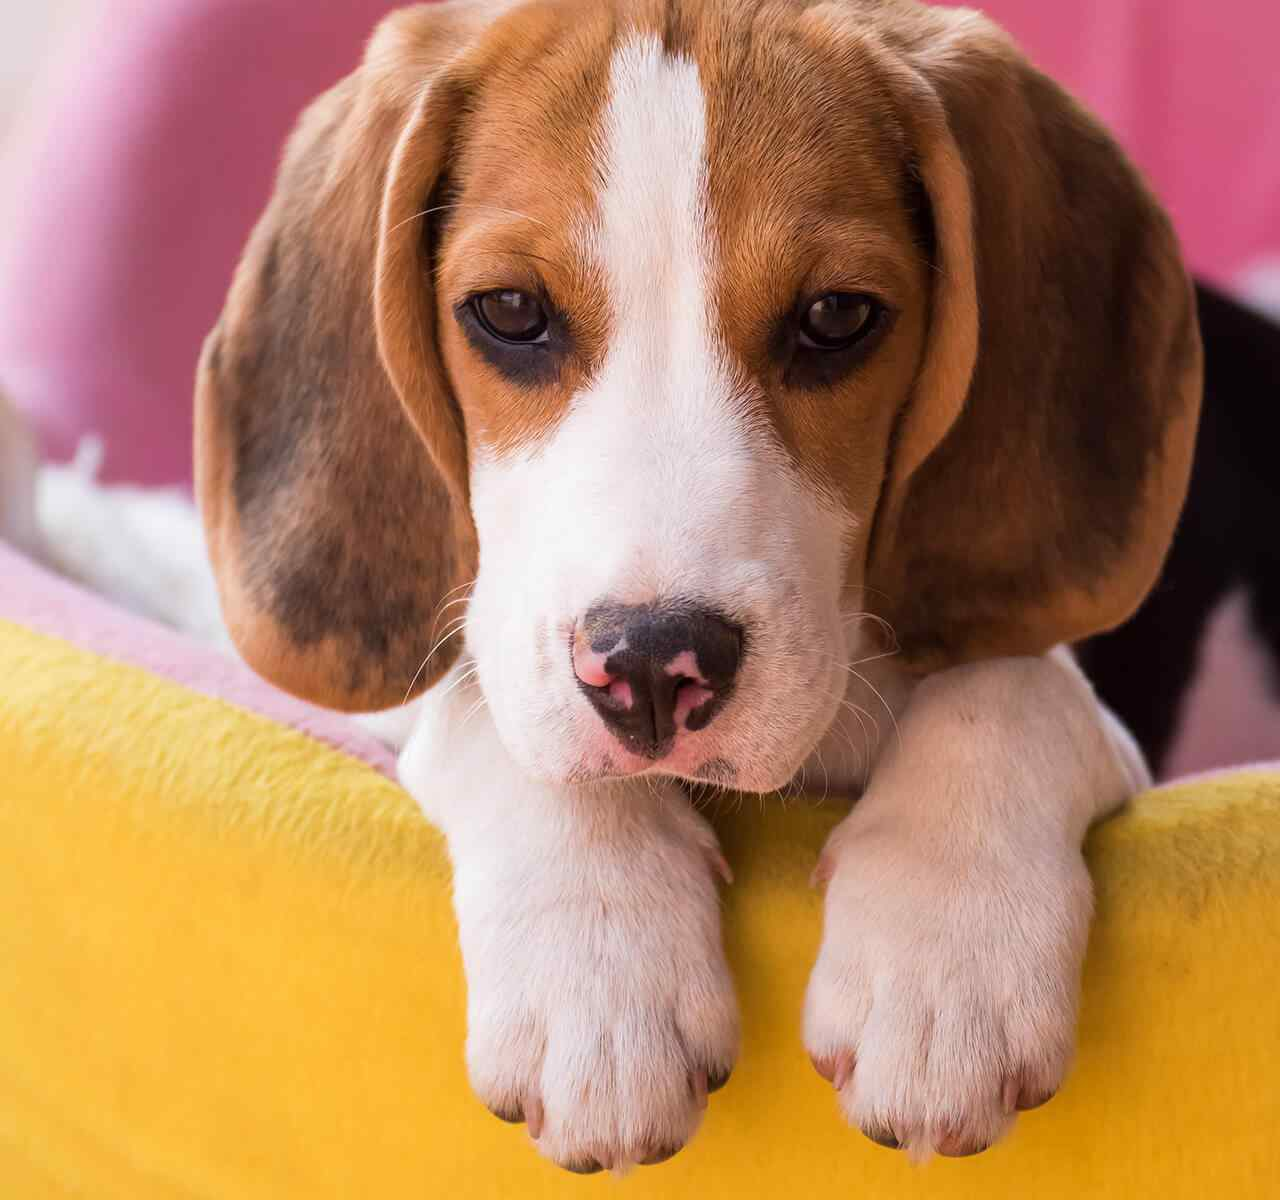 https://www.dogfitness.it/wp-content/uploads/2018/09/post_02-1-1280x1200.jpg